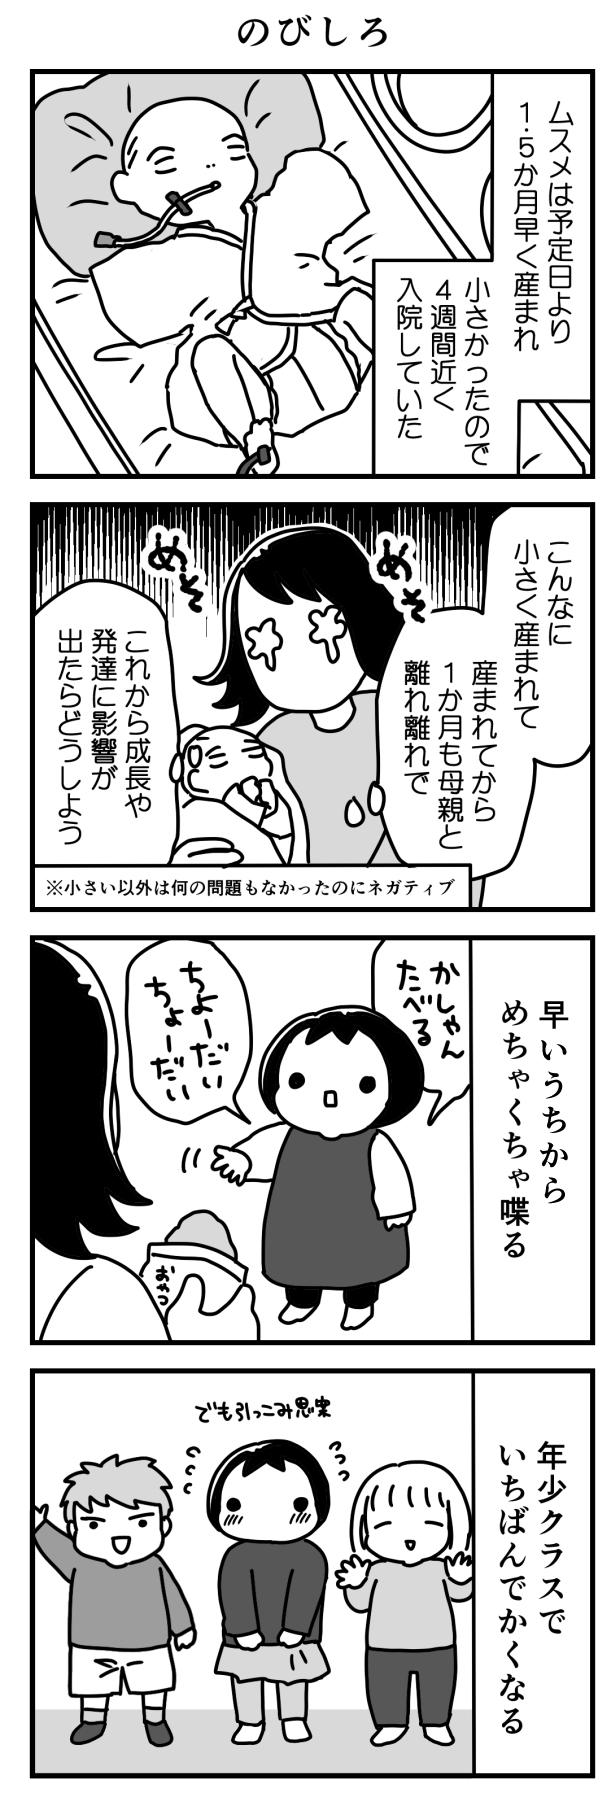 f:id:kanemotonomukuu:20201014120357j:plain